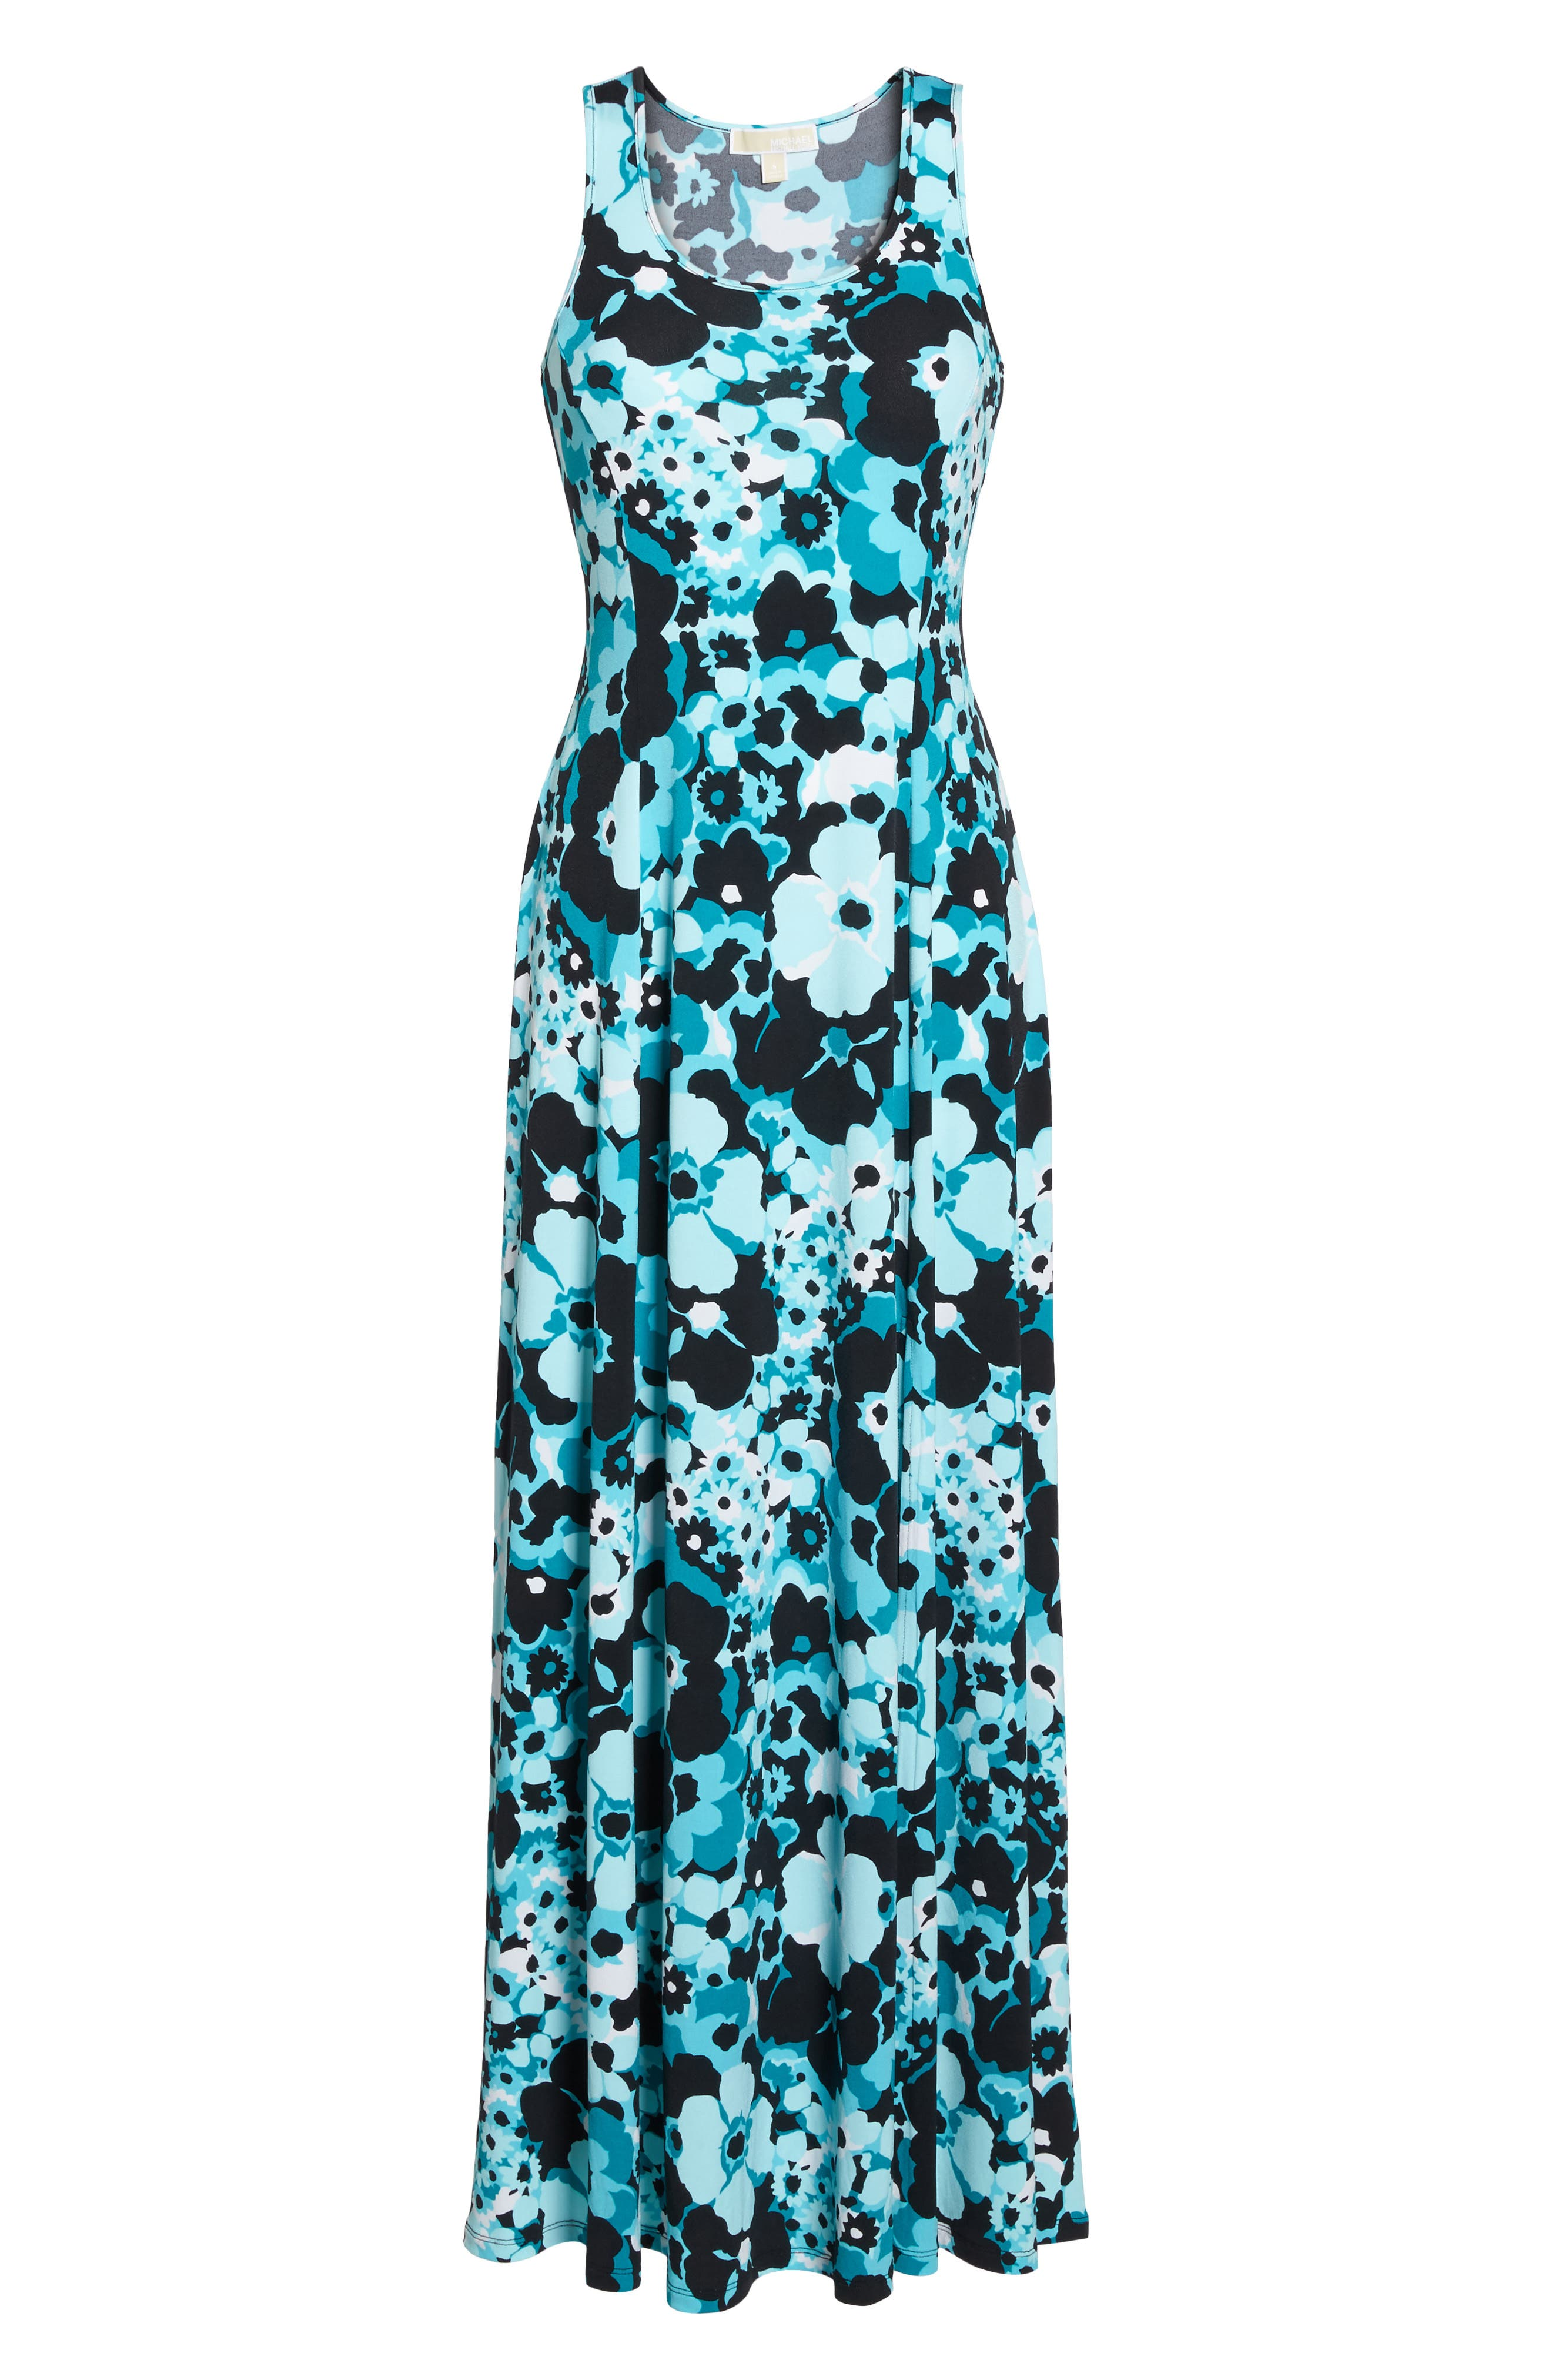 Spring Floral Maxi Dress,                             Alternate thumbnail 6, color,                             Tile Blue/ Black Multi